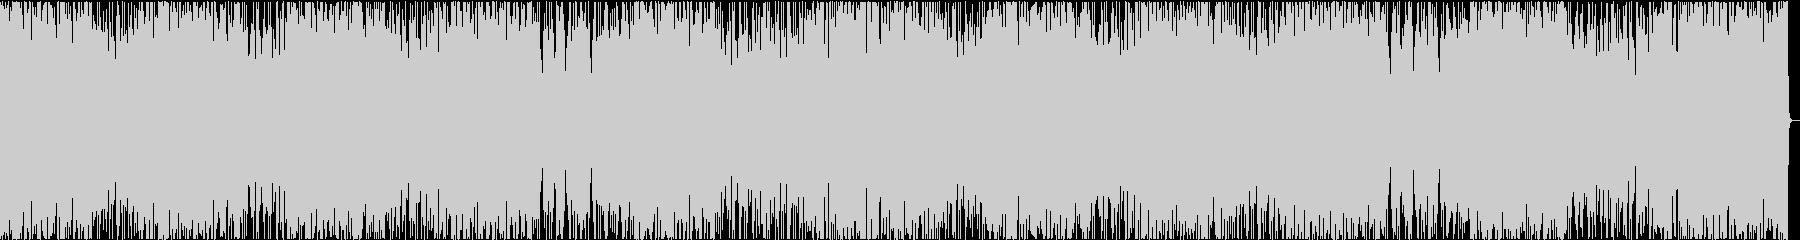 Ikeike / Fast Jazz's unreproduced waveform